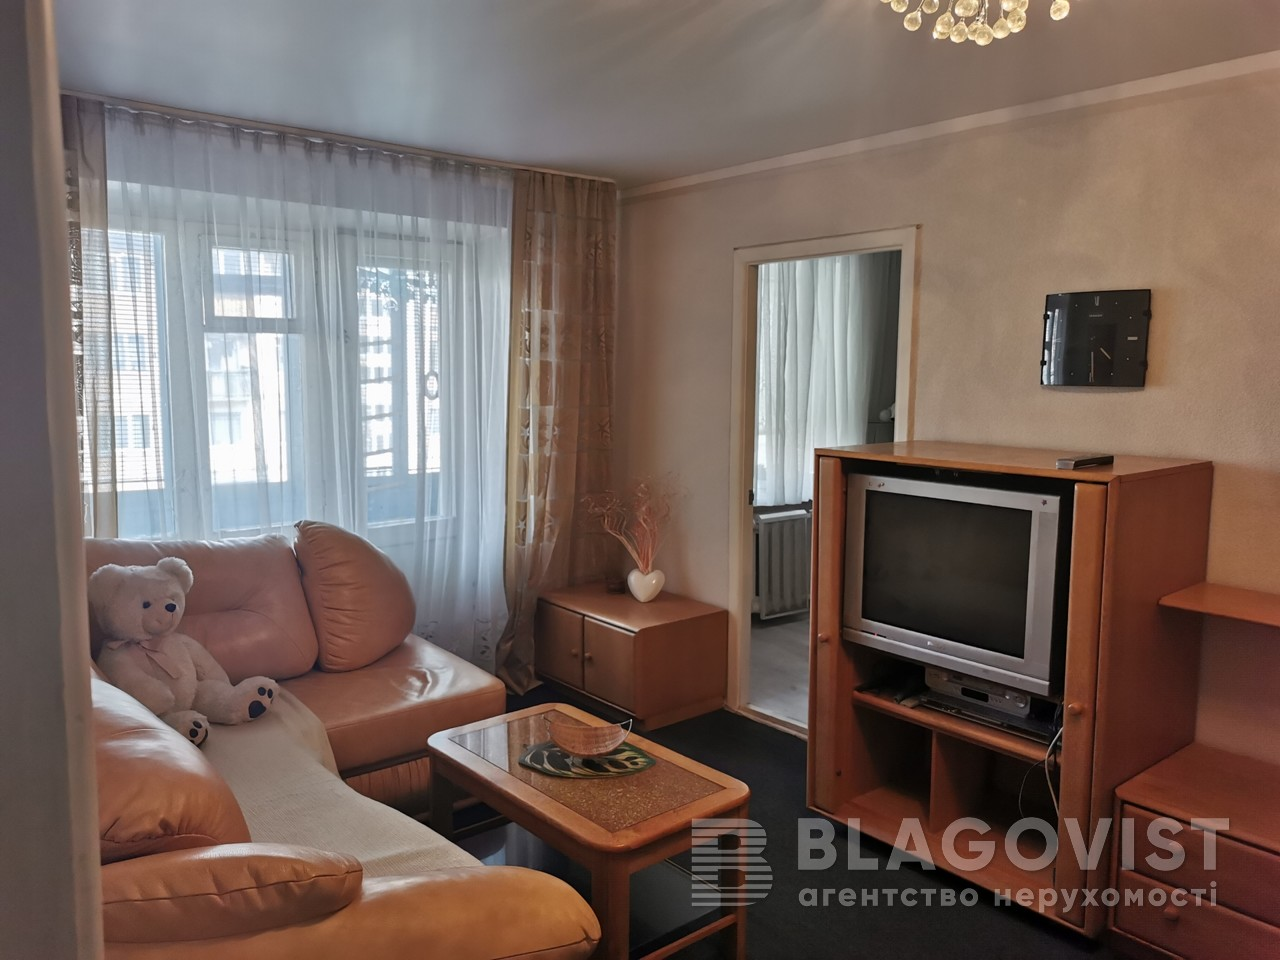 Квартира R-40023, Харьковское шоссе, 3, Киев - Фото 3